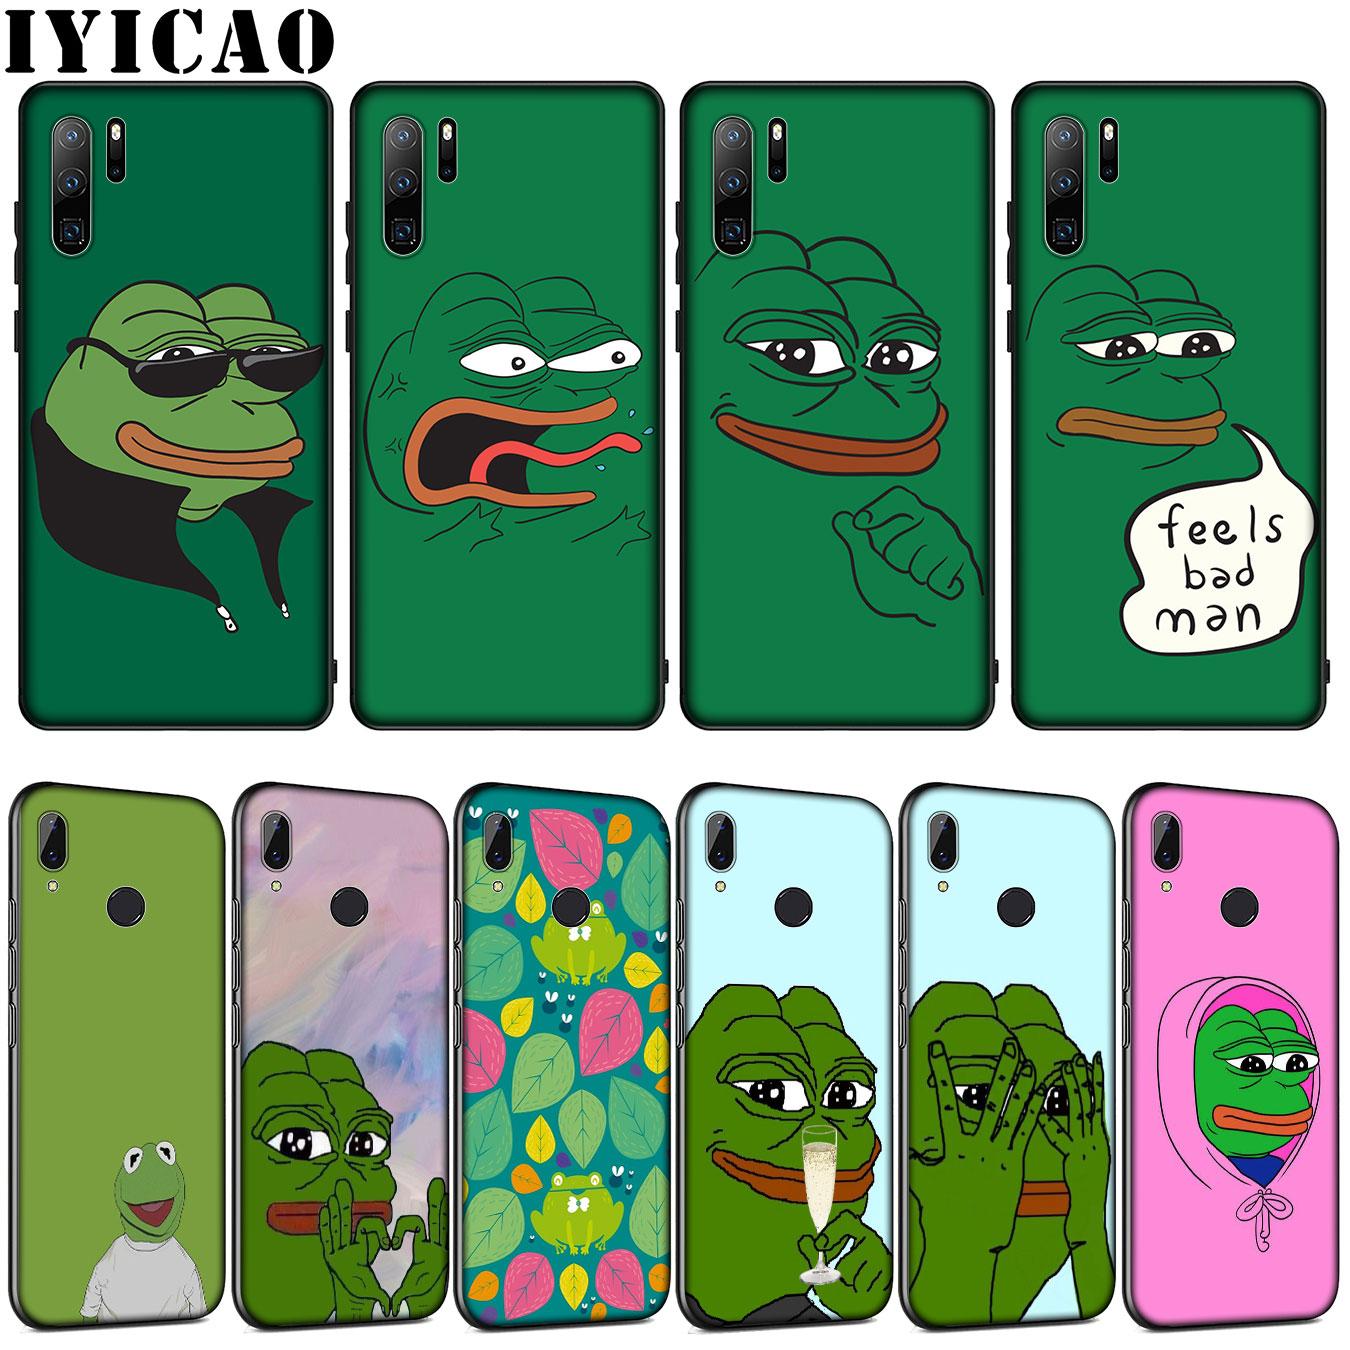 the Frog meme pepe Soft Silicone Case for Huawei P30 P20 Pro P10 P9 Lite Mini 2017 2016 P Smart Z Plus 2019